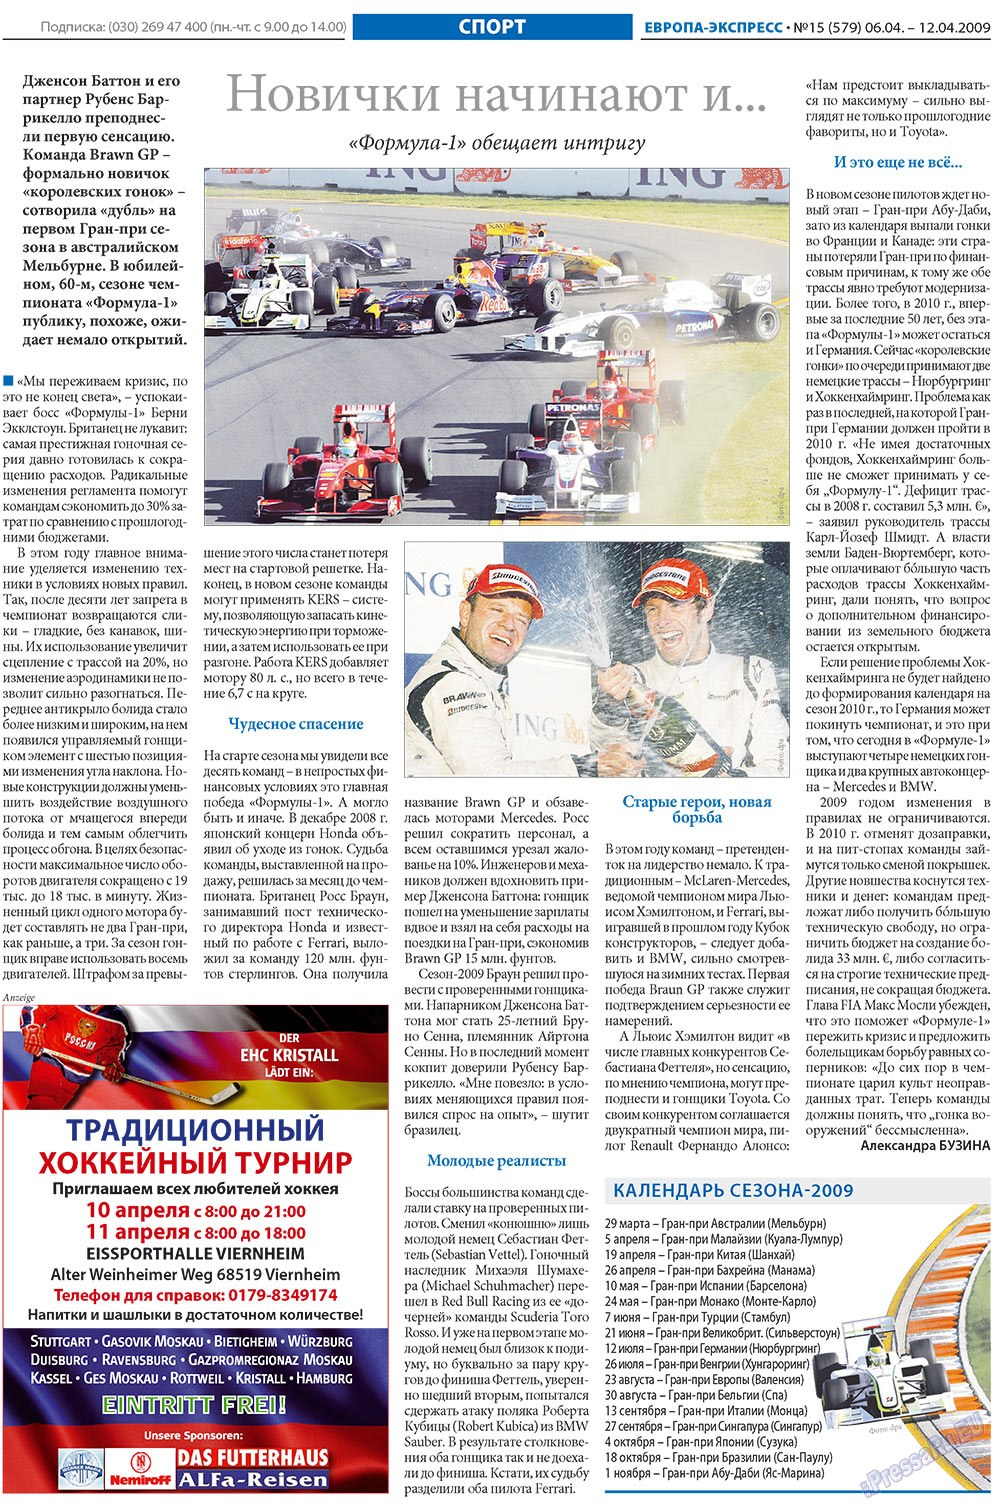 Европа экспресс (газета). 2009 год, номер 15, стр. 24